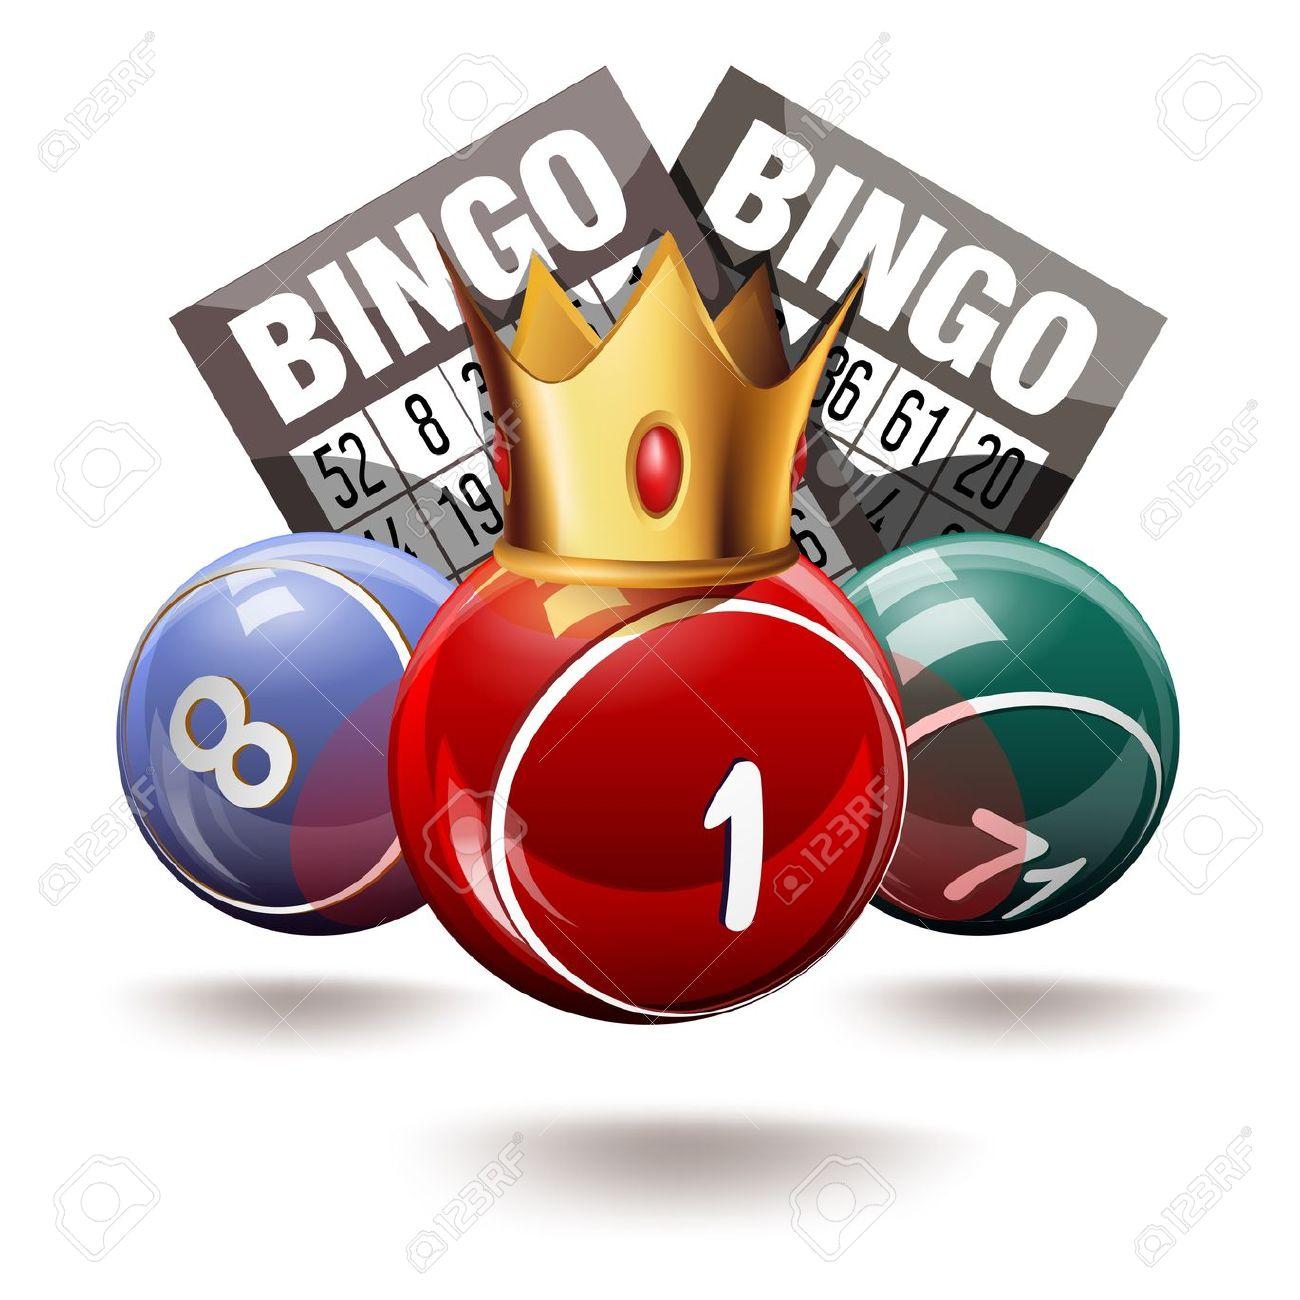 madagascar matin royal bingo loto une femme gagne l extra bingo de 10 millions d ariary. Black Bedroom Furniture Sets. Home Design Ideas